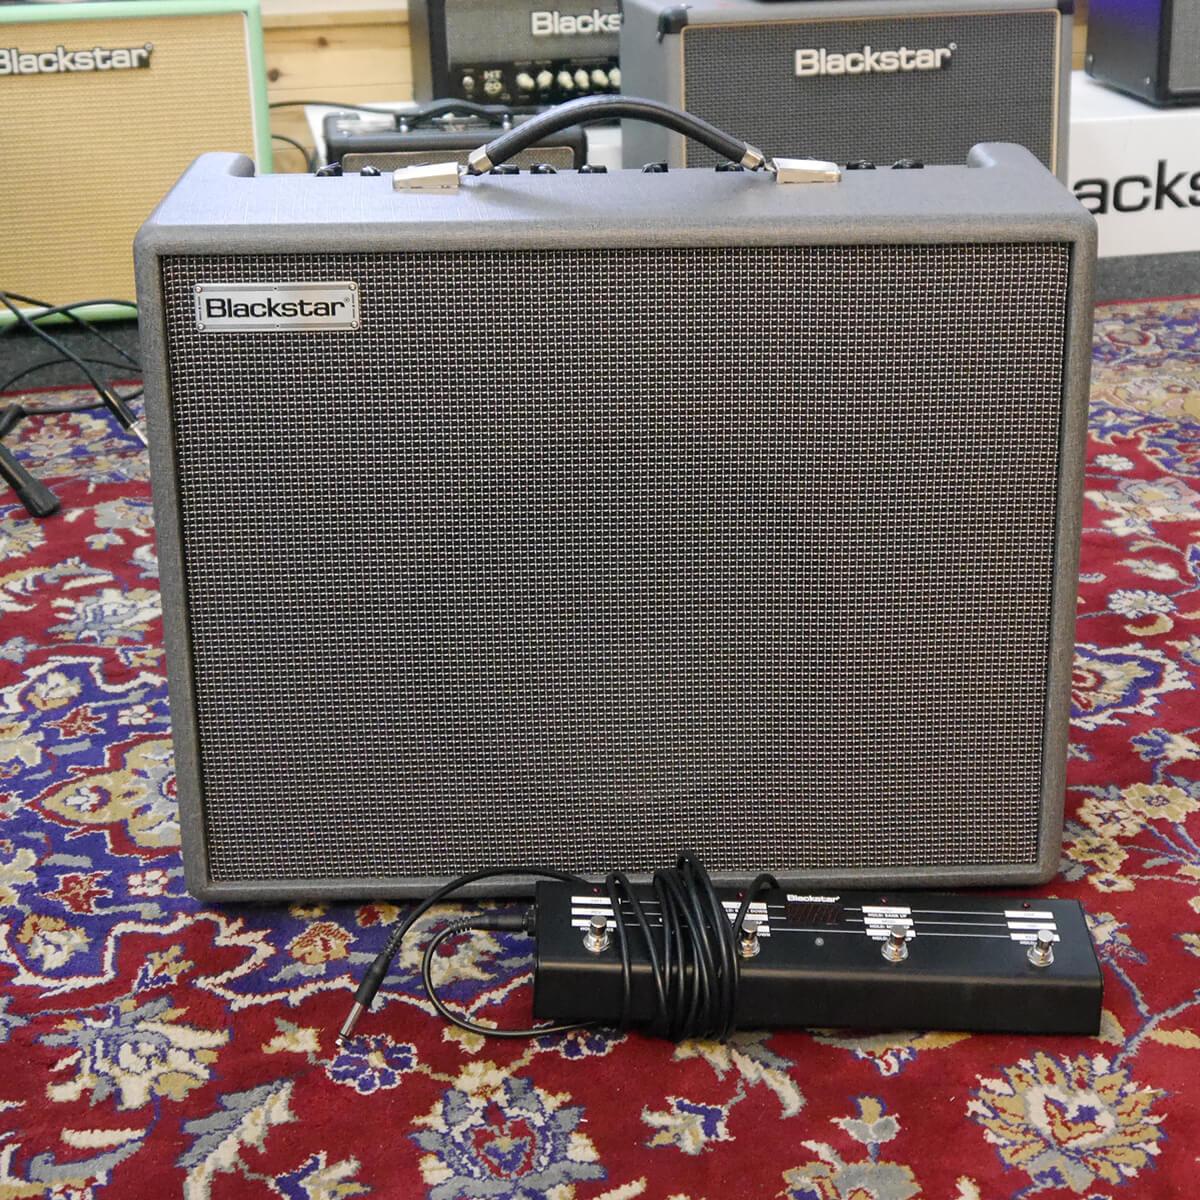 Blackstar Silverline 100 Combo Amplifier & Footswitch - 2nd Hand